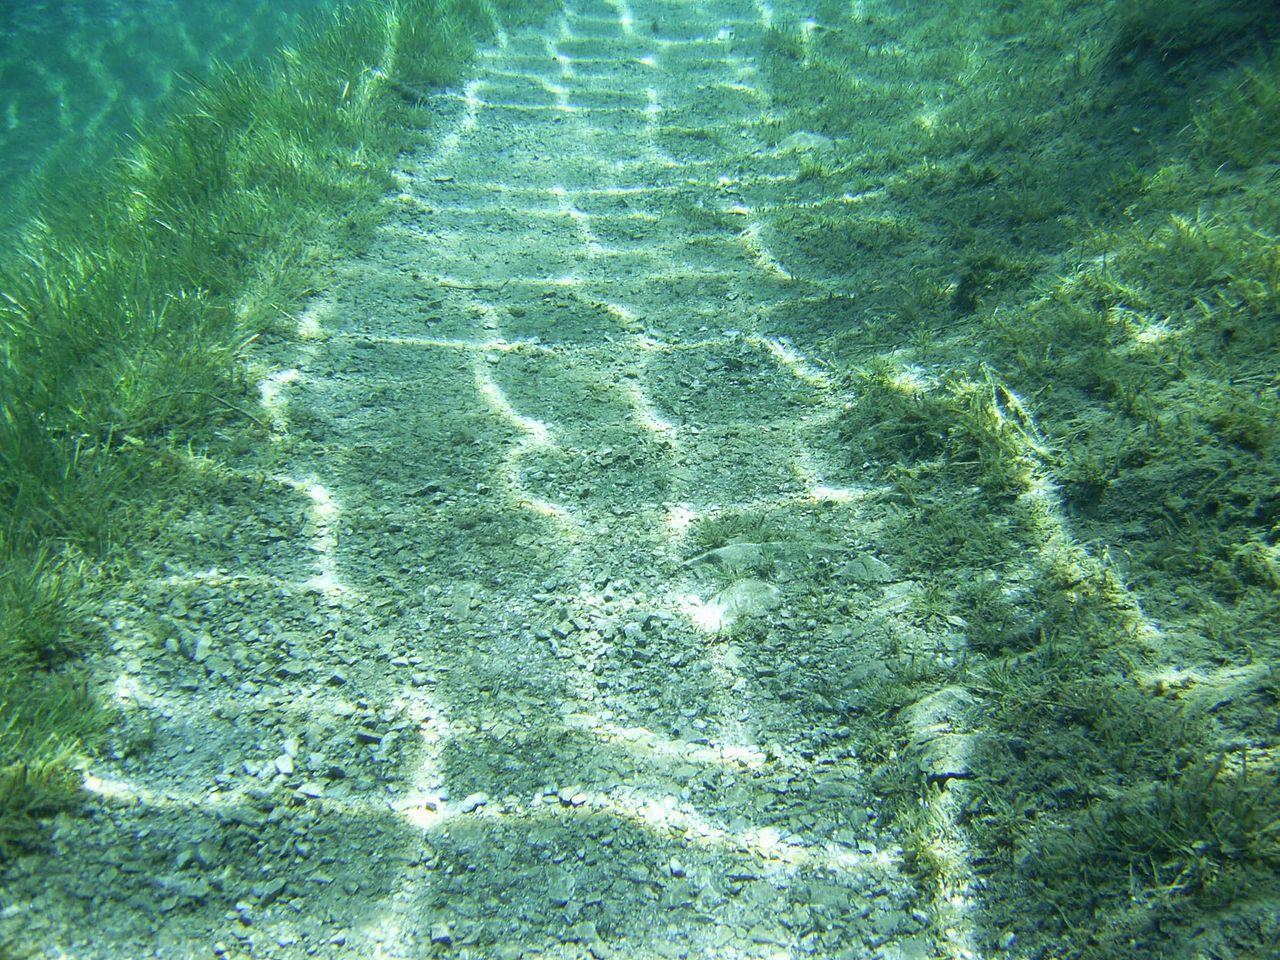 Зеленое озеро, дорога под водой